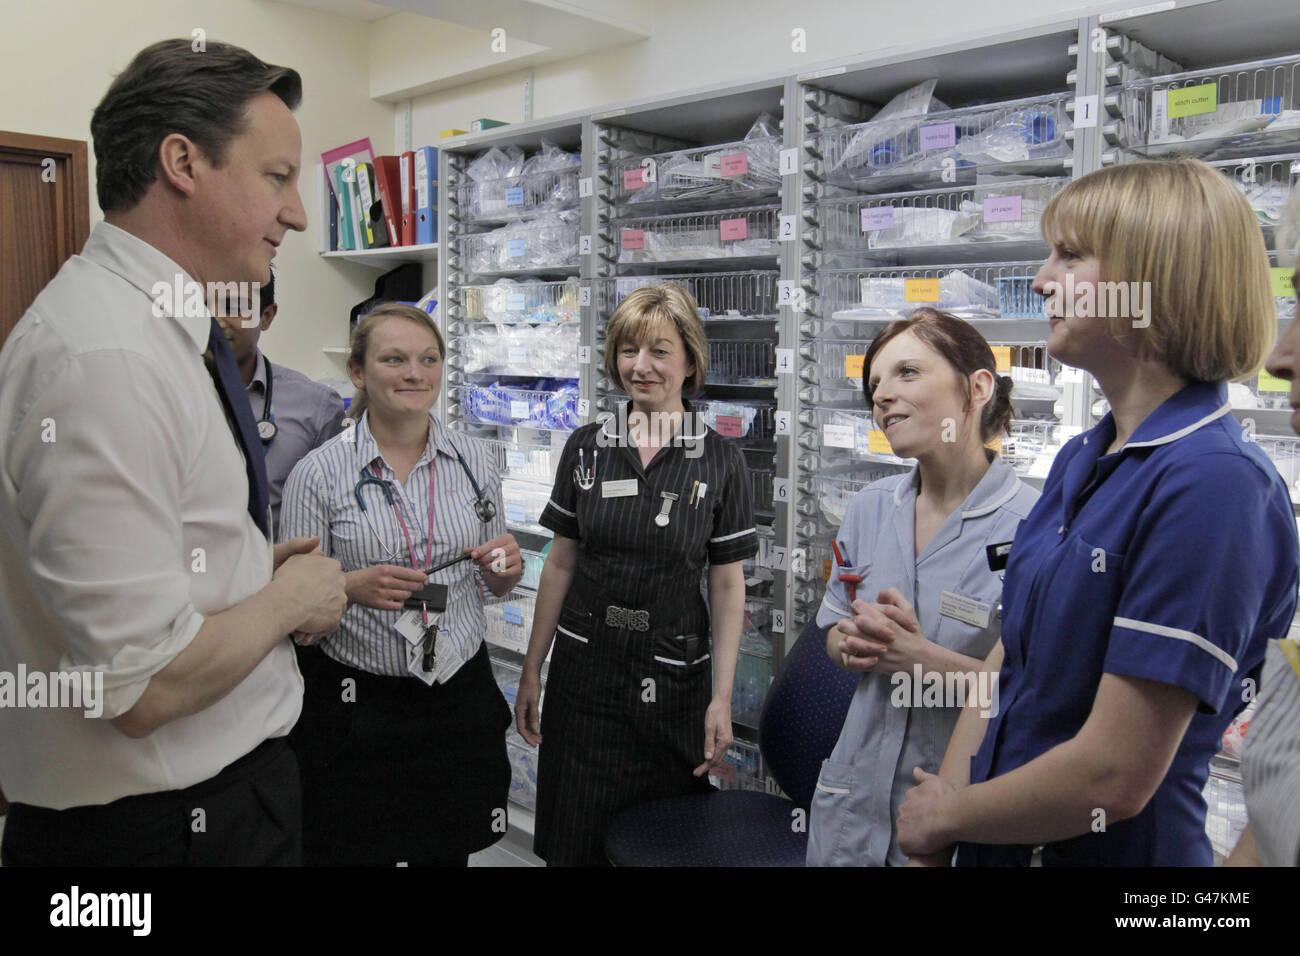 Britain's Prime Minister David Cameron talks to hospital staff at Frimley Park Hospital. Stock Photo